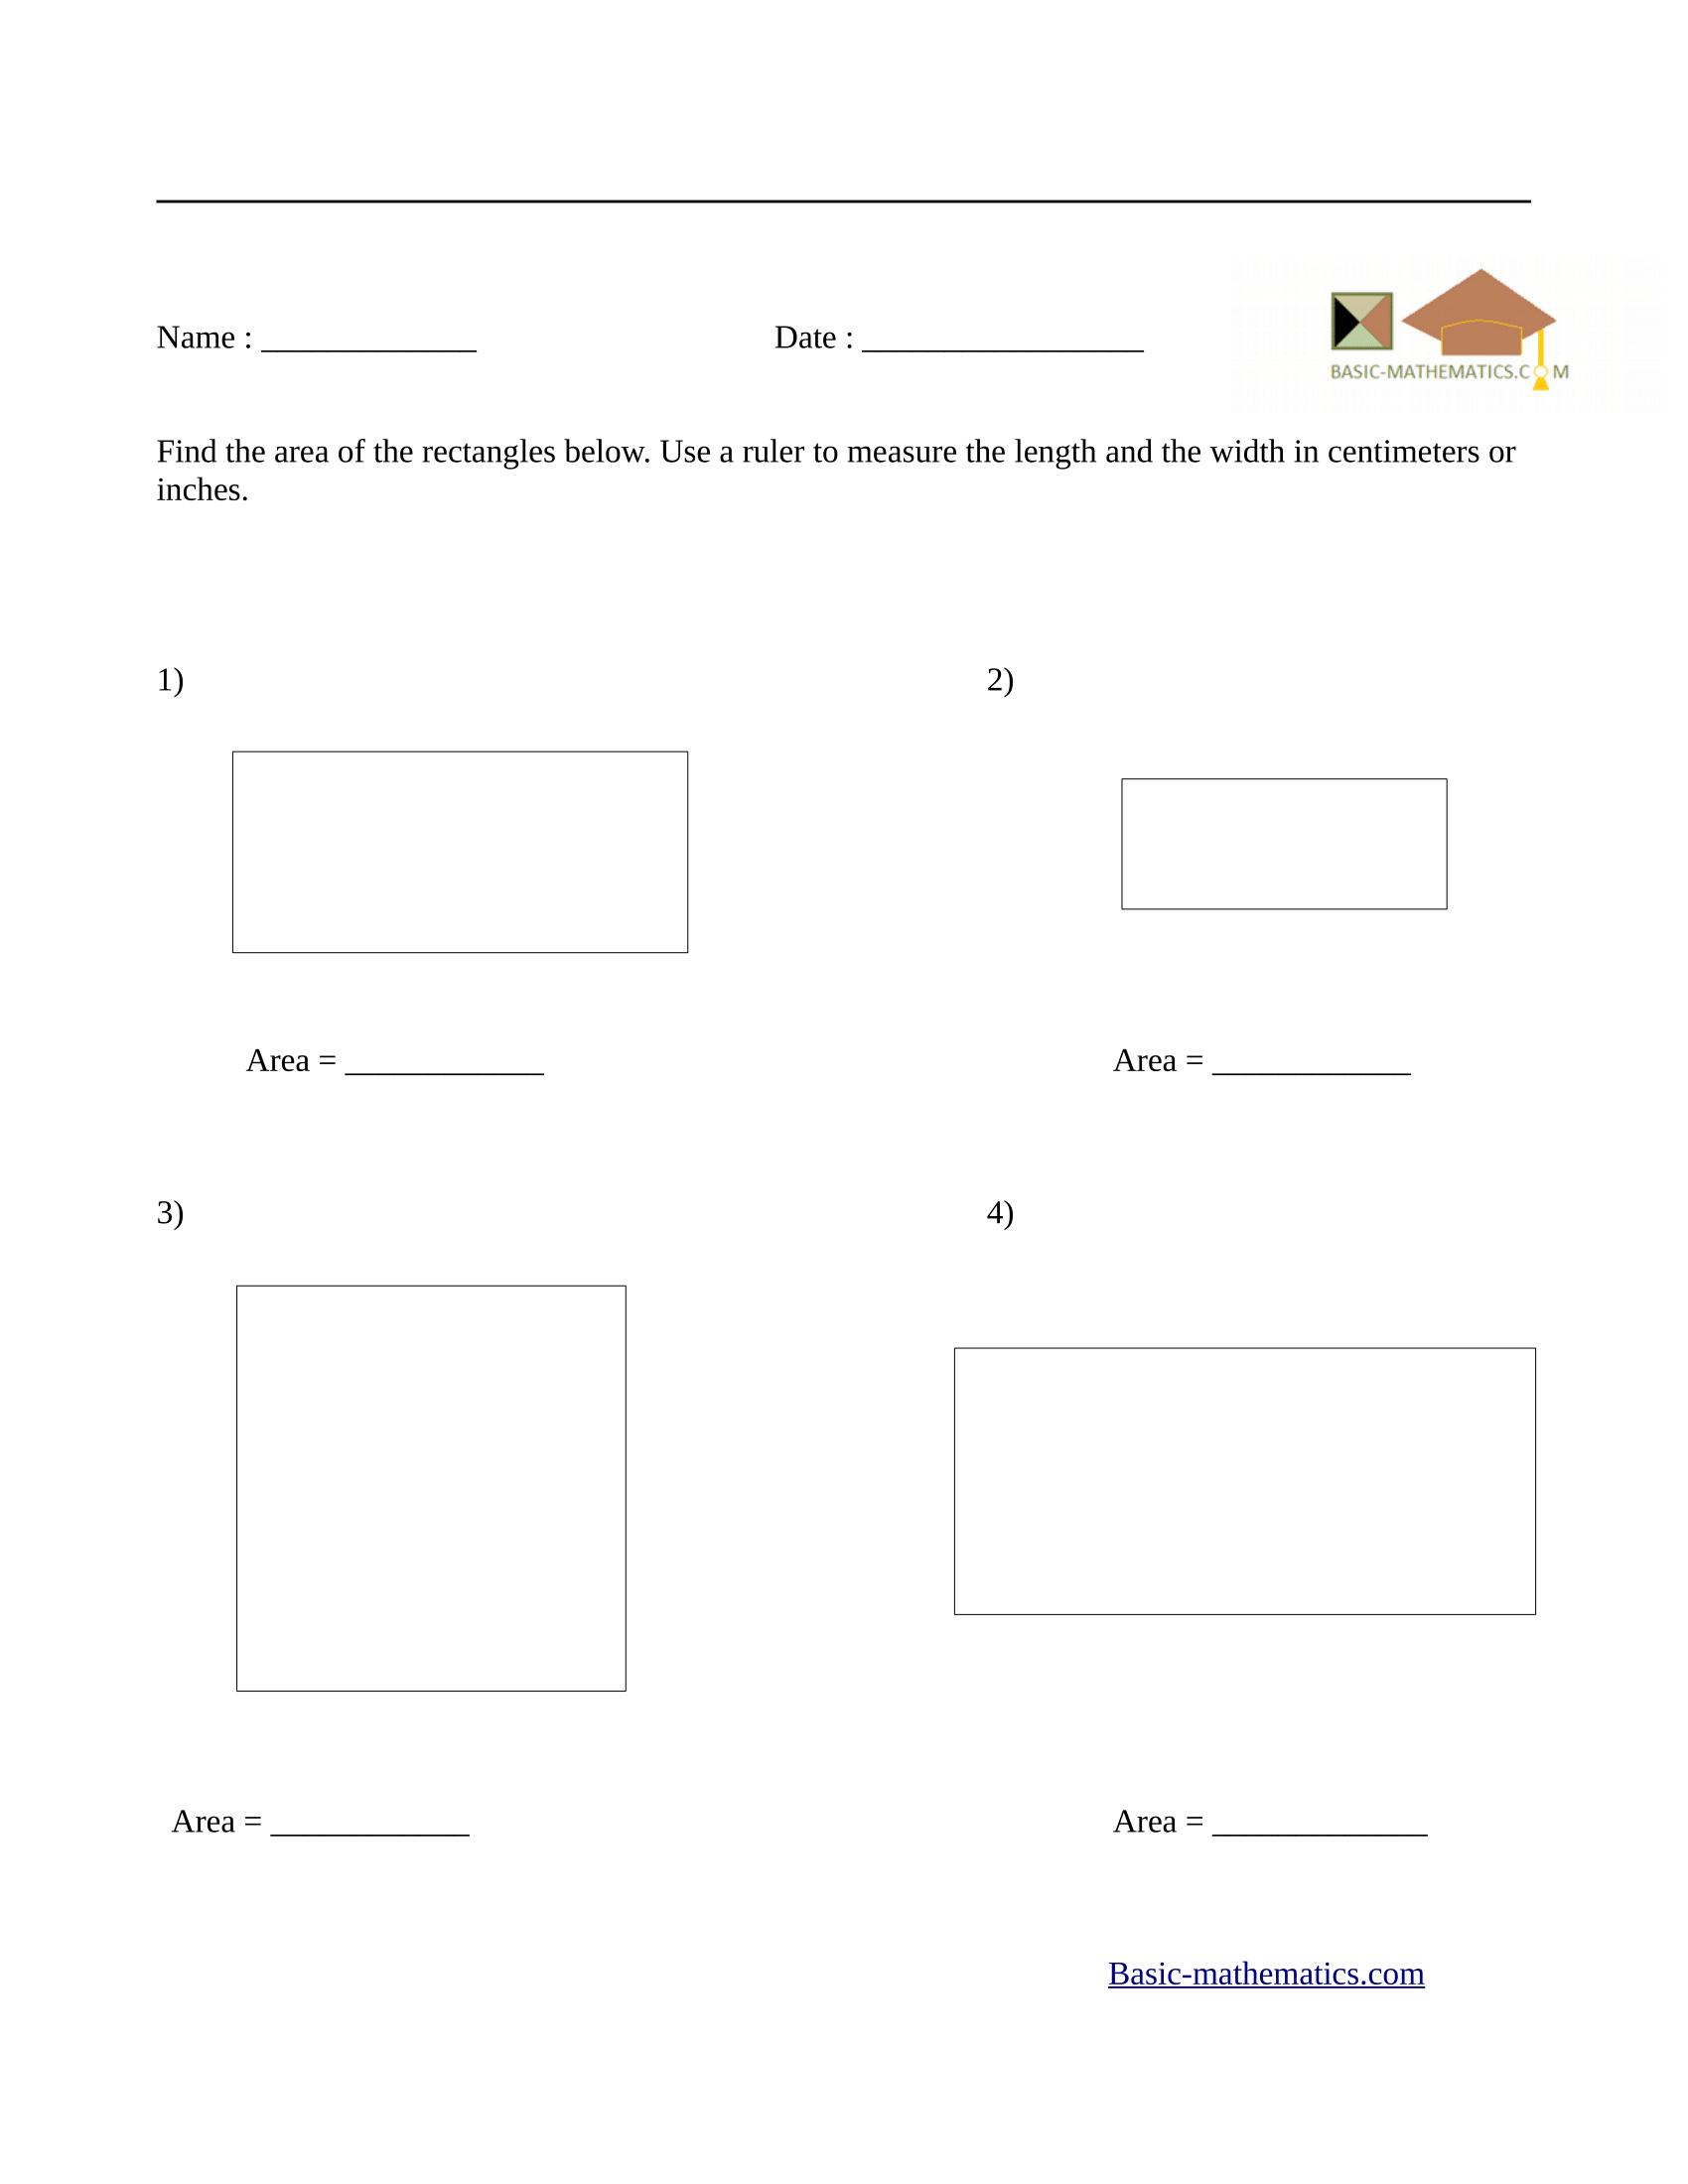 Area of rectangles worksheet 5